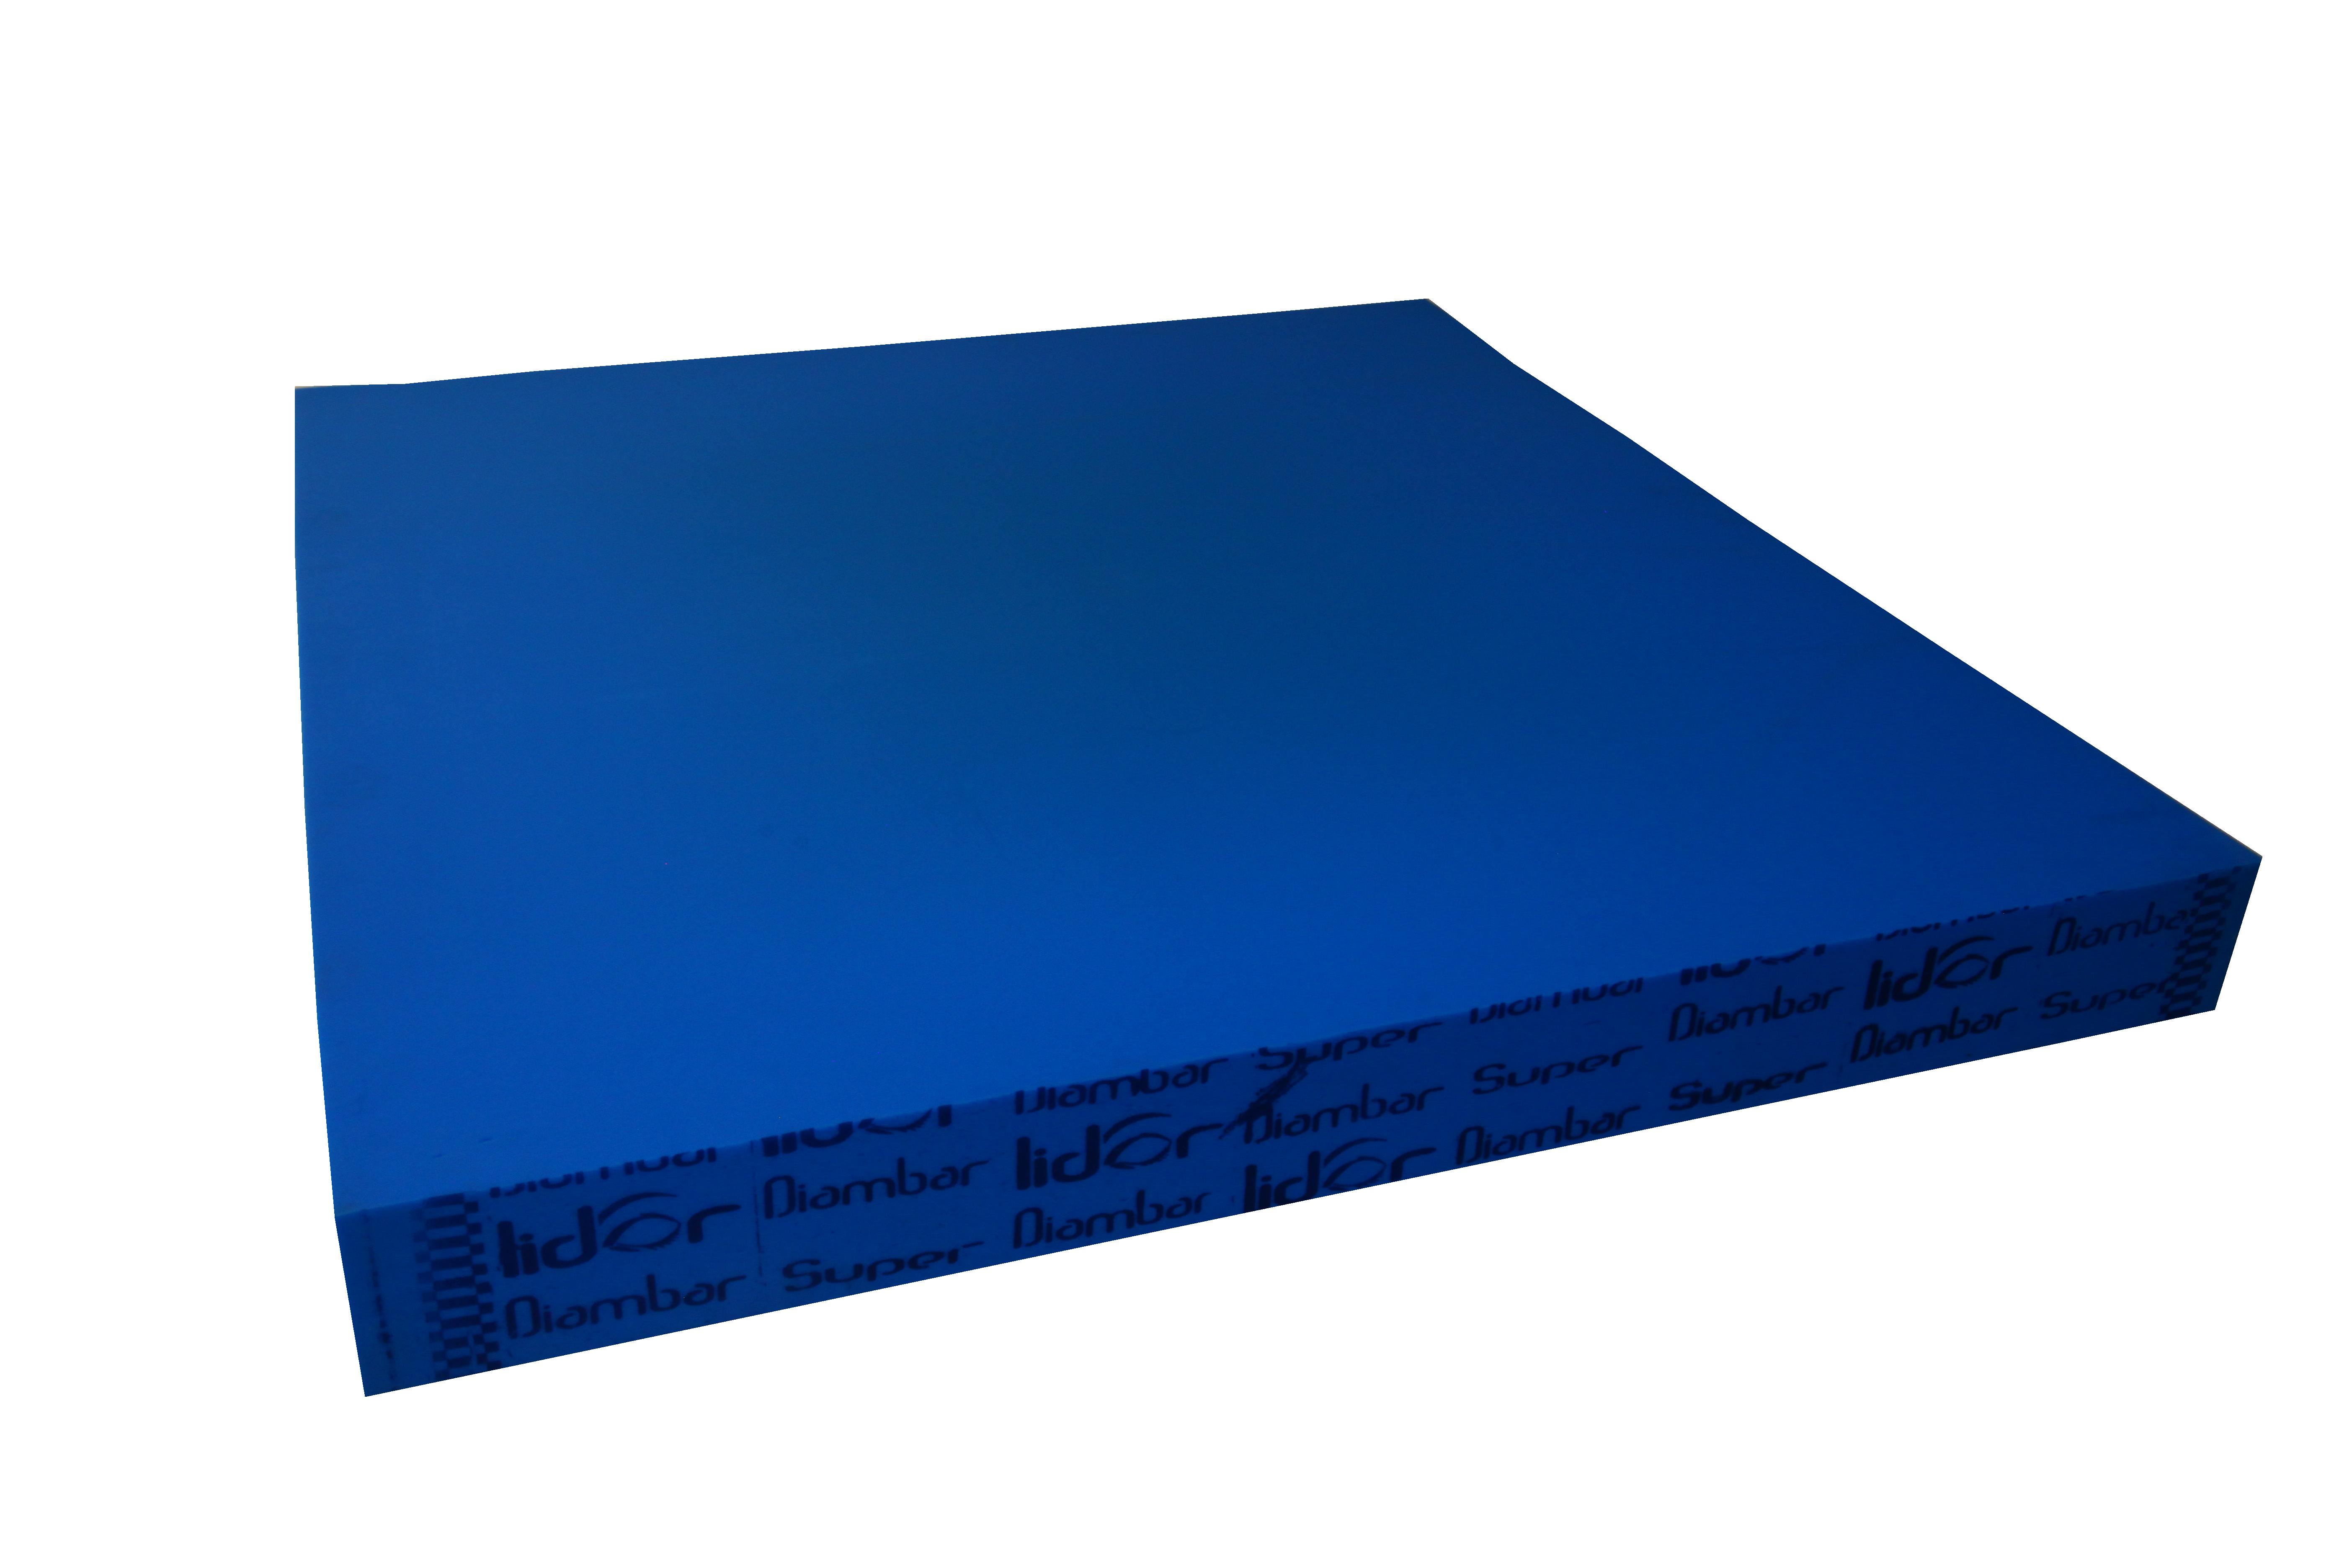 Super Diambar 190 x 185 18 cm(1)